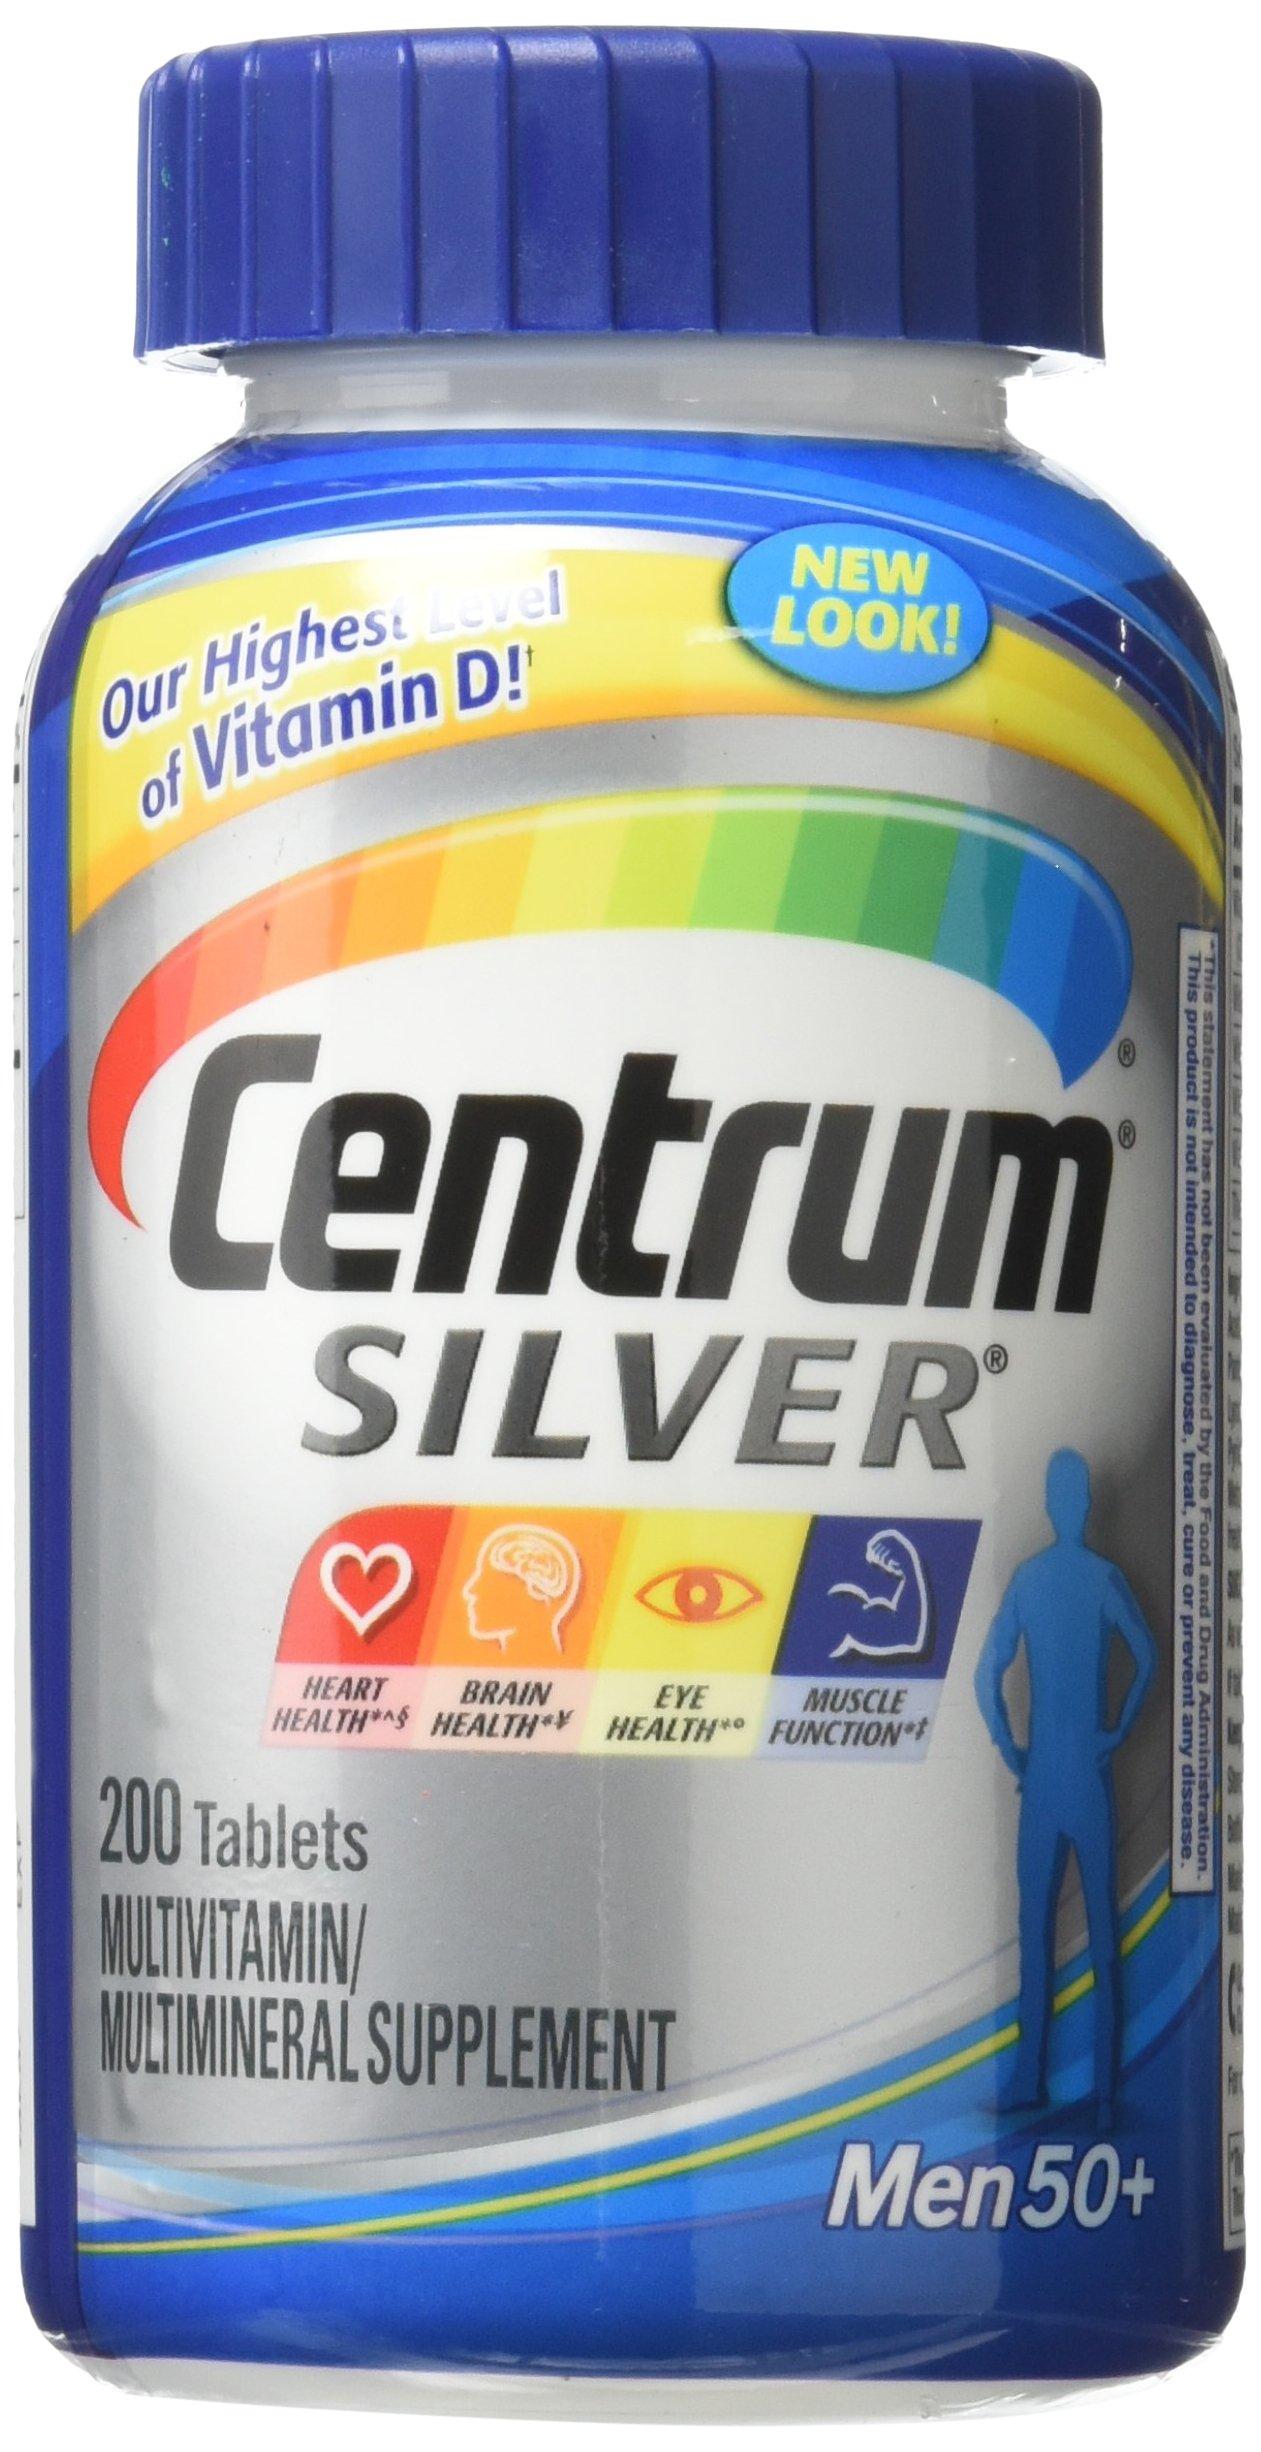 Centrum Silver Men Multivitamin / Multimineral Supplement Tablet, Vitamin D, Age 50+ (200 Count)